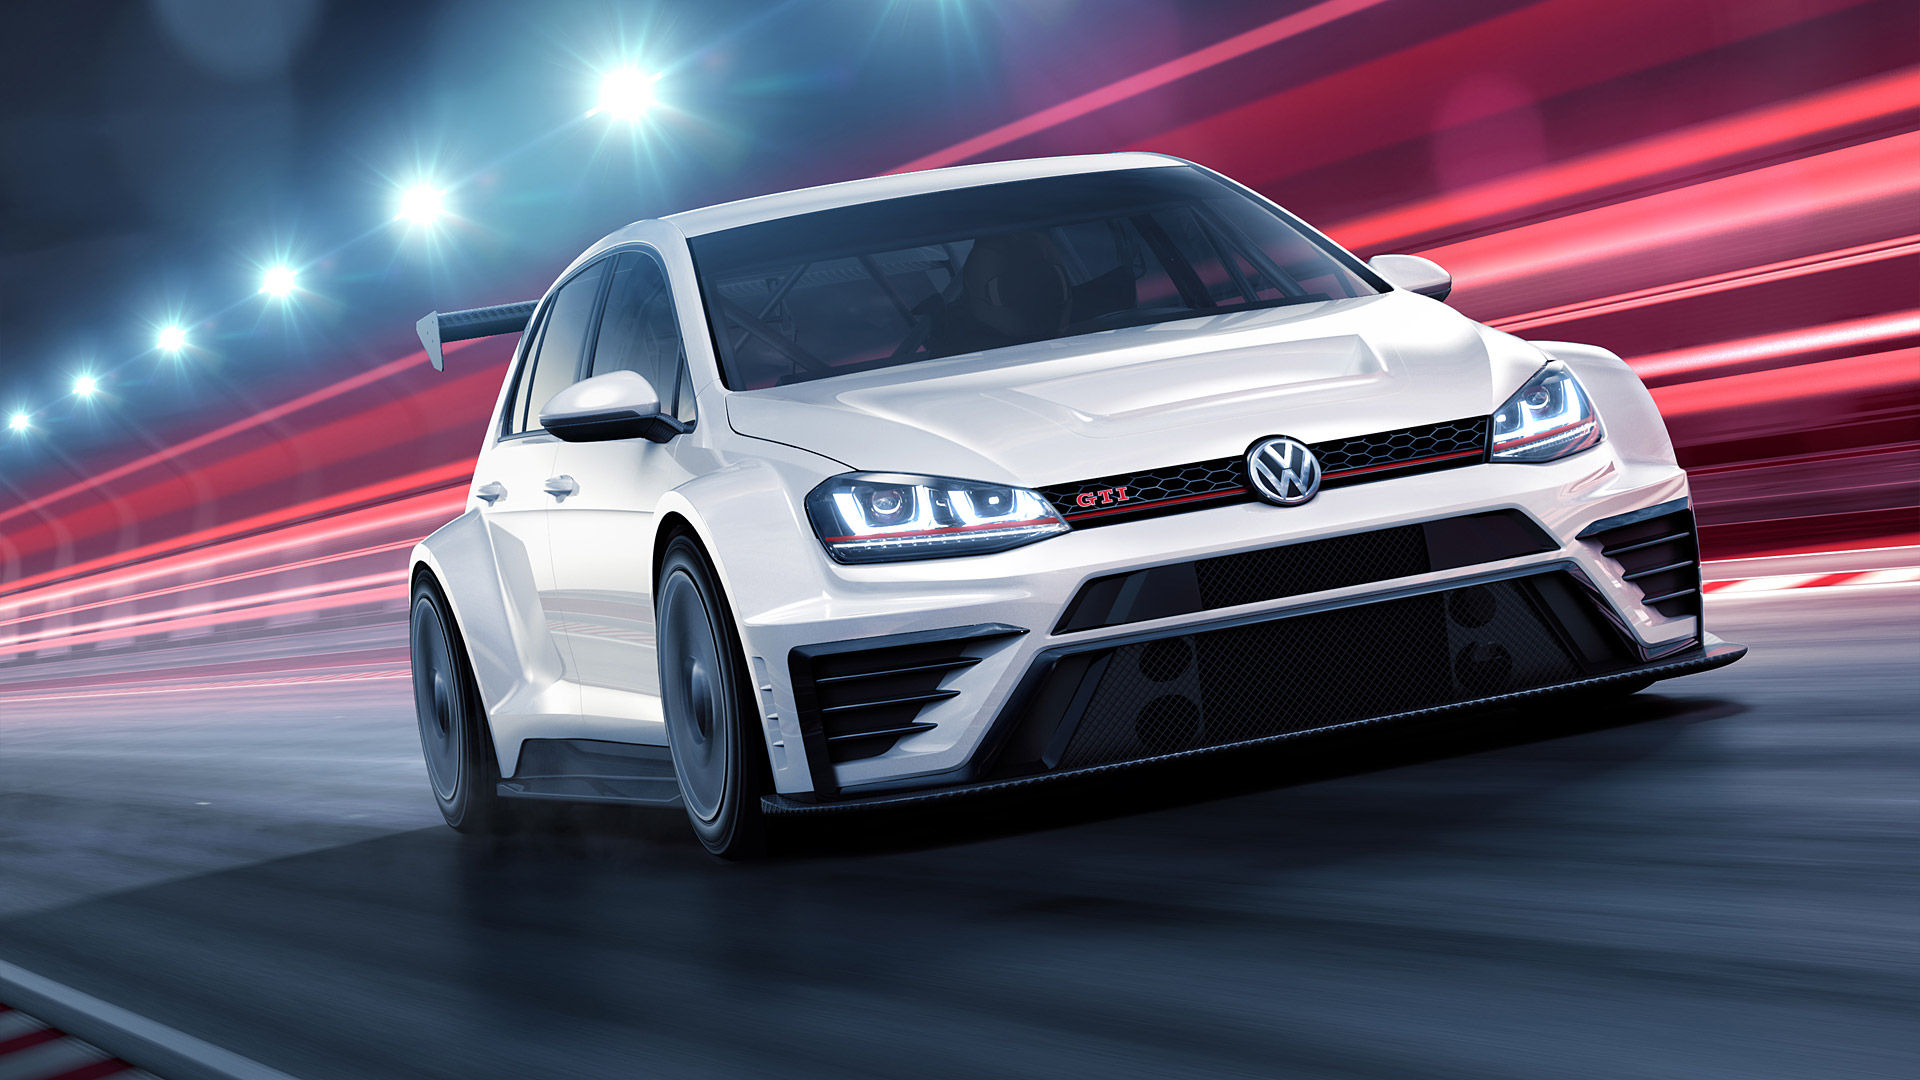 2016 Volkswagen Golf GTI TCR